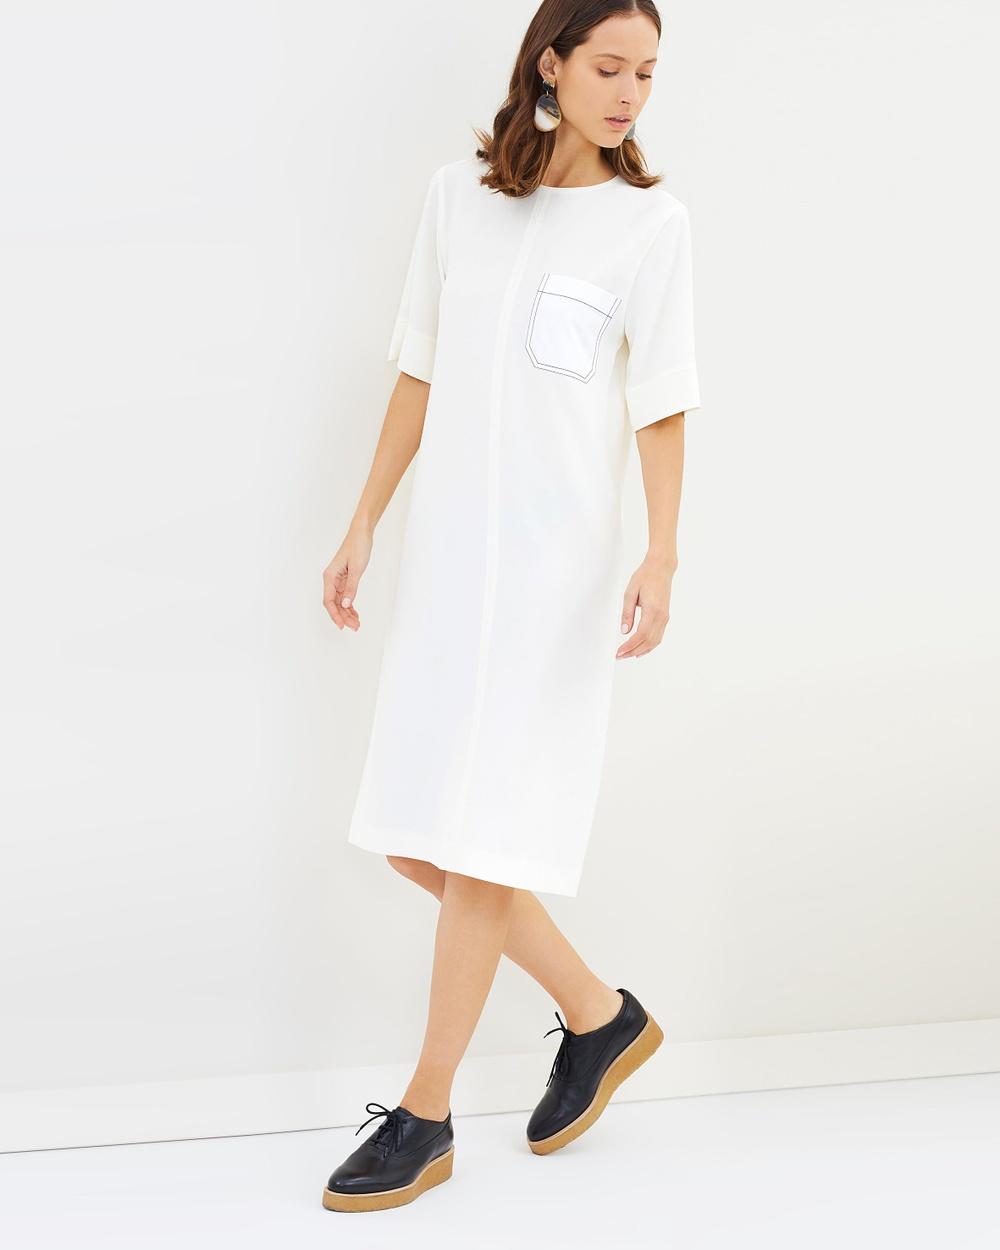 Joseph Ellis Fluid Twill Dress Dresses Off White Ellis Fluid Twill Dress